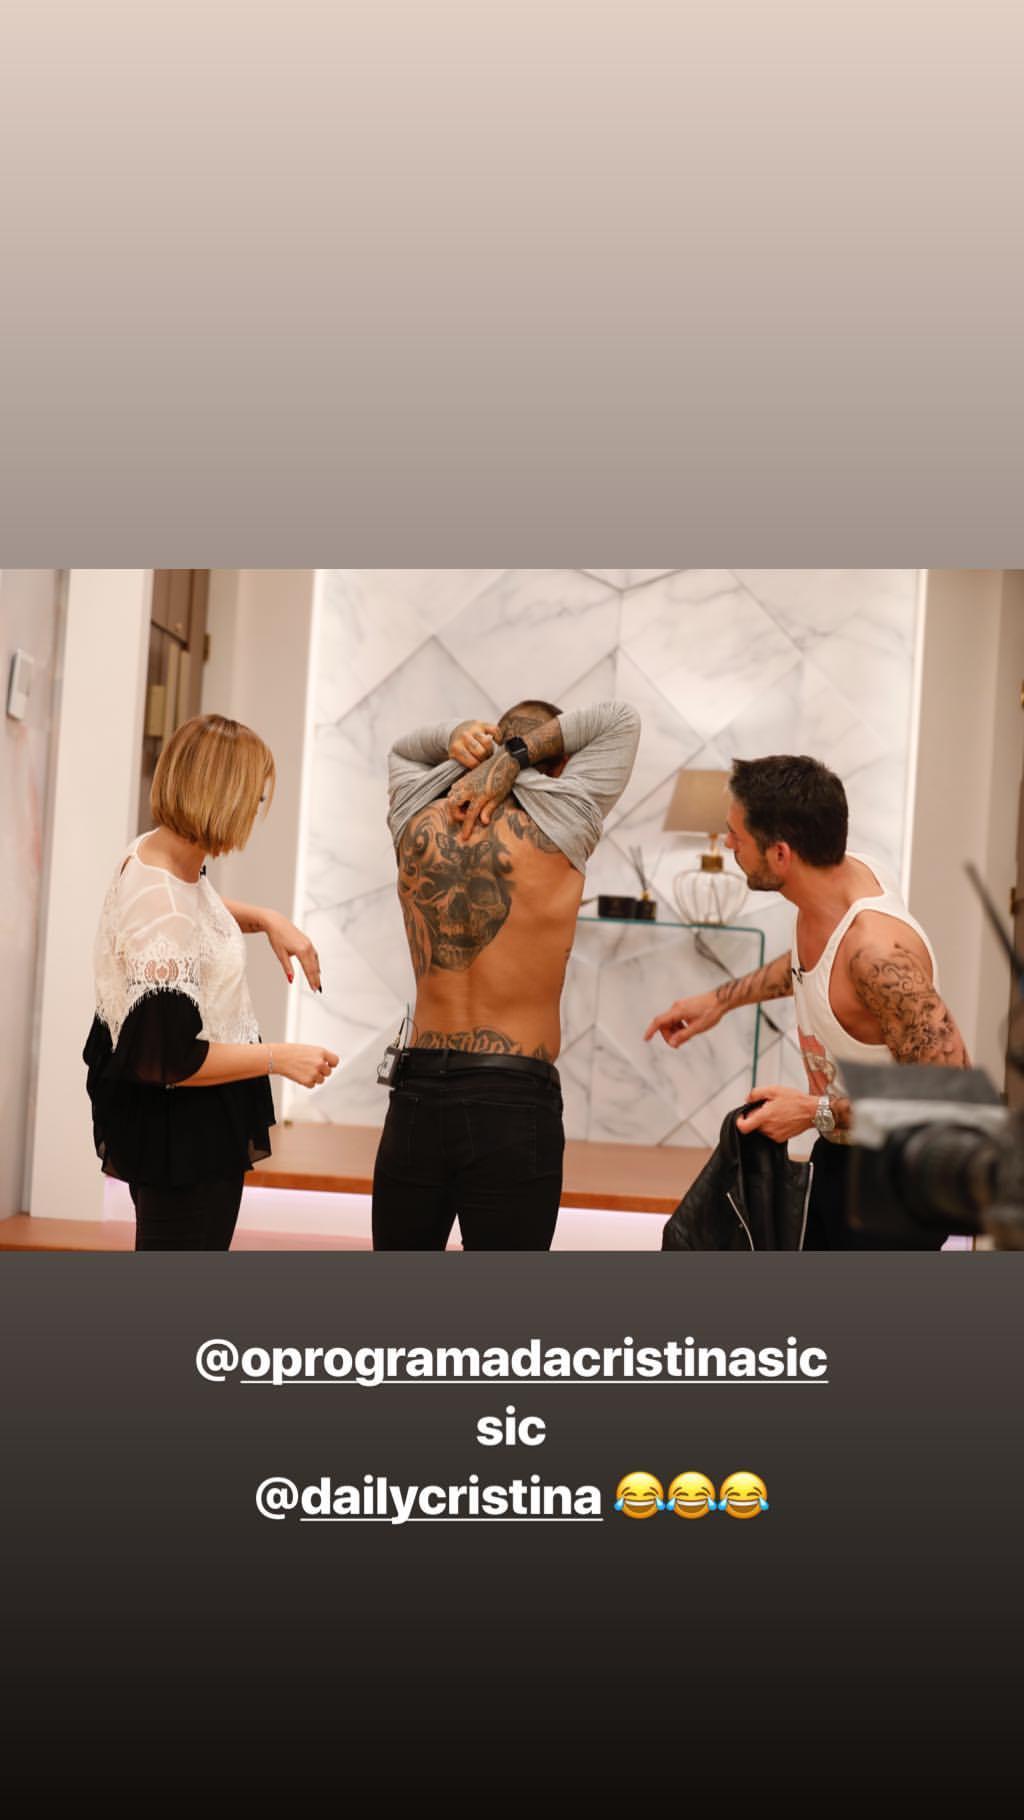 Cantor Todo Tatuado Brasileiro cláudio ramos surge todo tatuado e é criticado: «É horrÍvel»